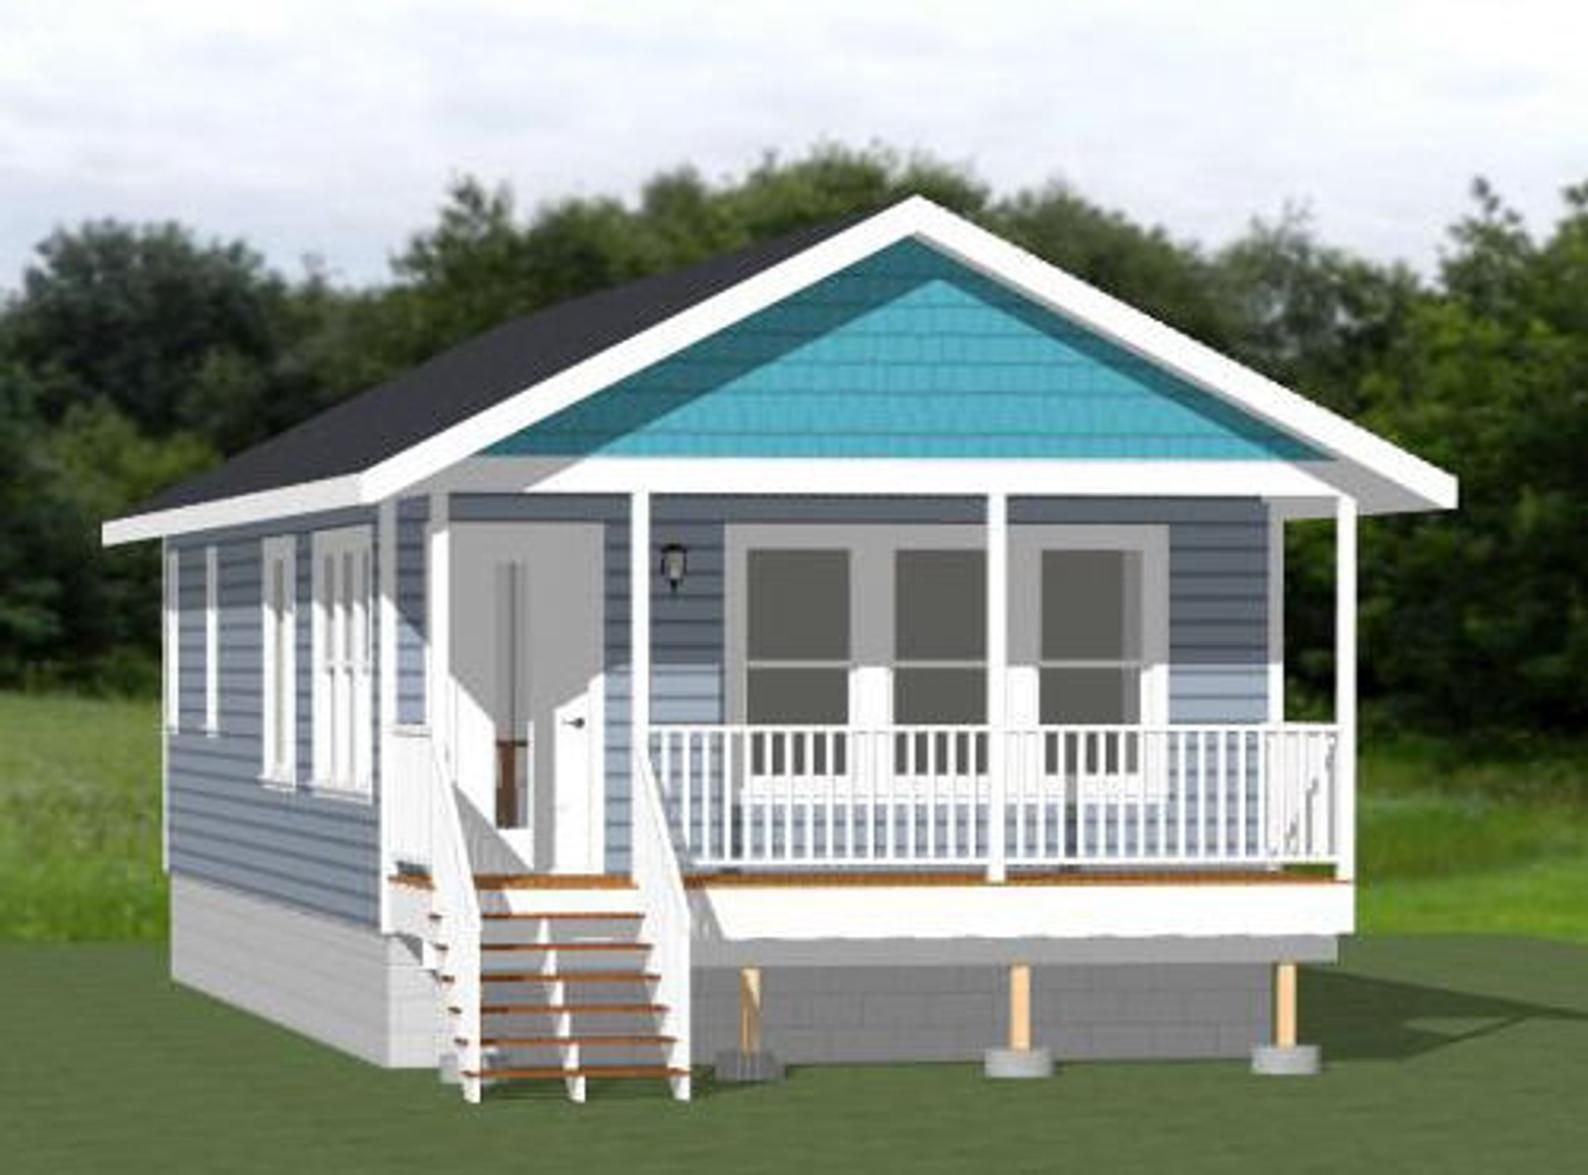 18x40 House 1 Bedroom 1 Bath 720 sq ft PDF Floor Plan